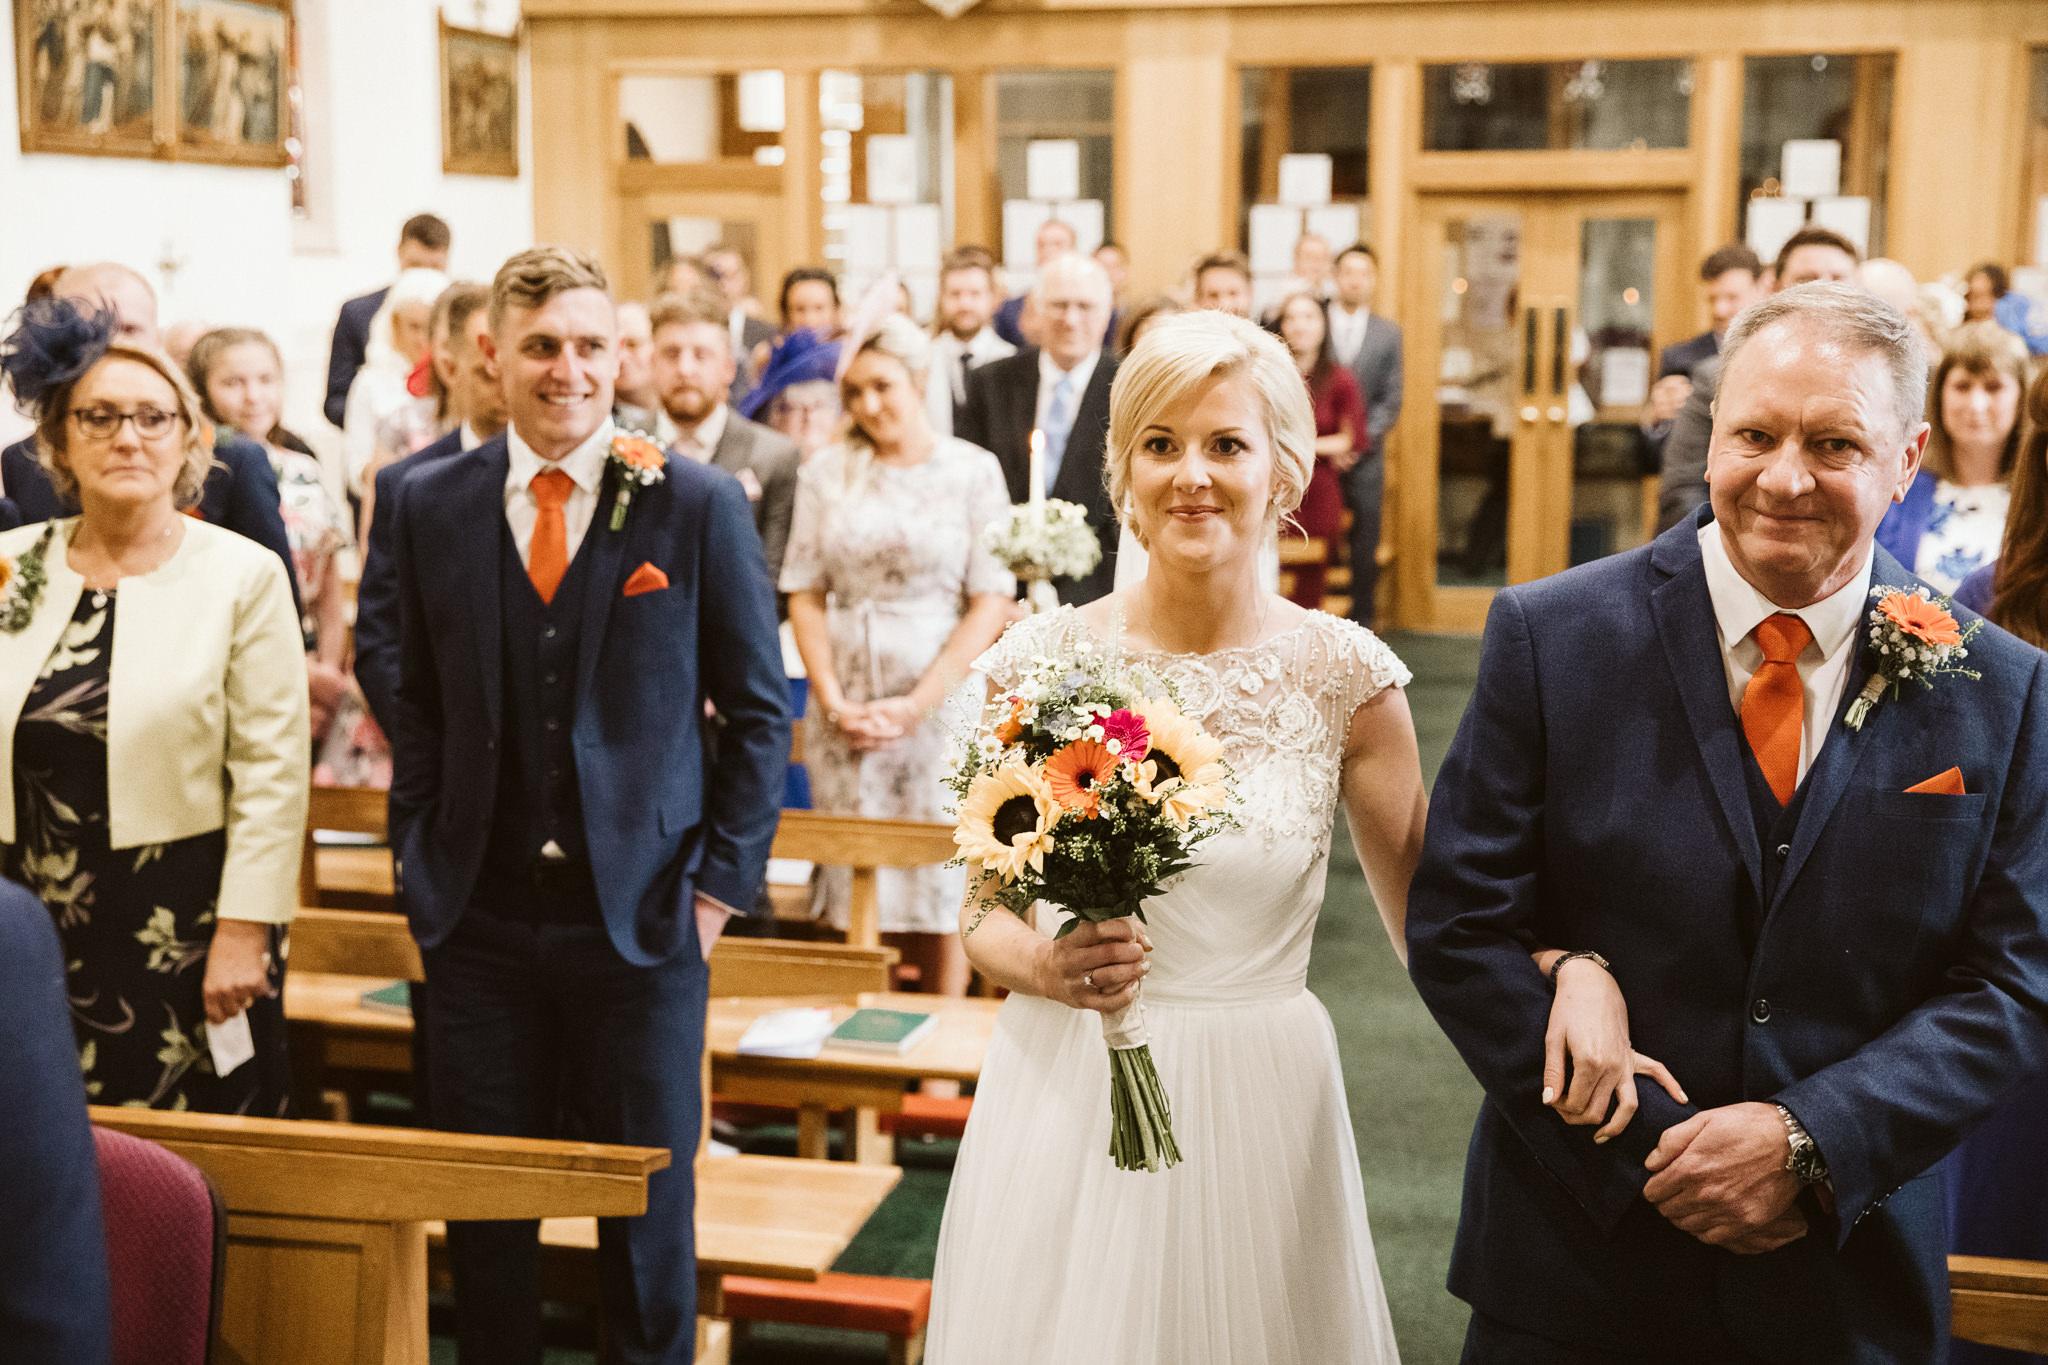 northside-farm-wedding-northumberland-margarita-hope (25).jpg